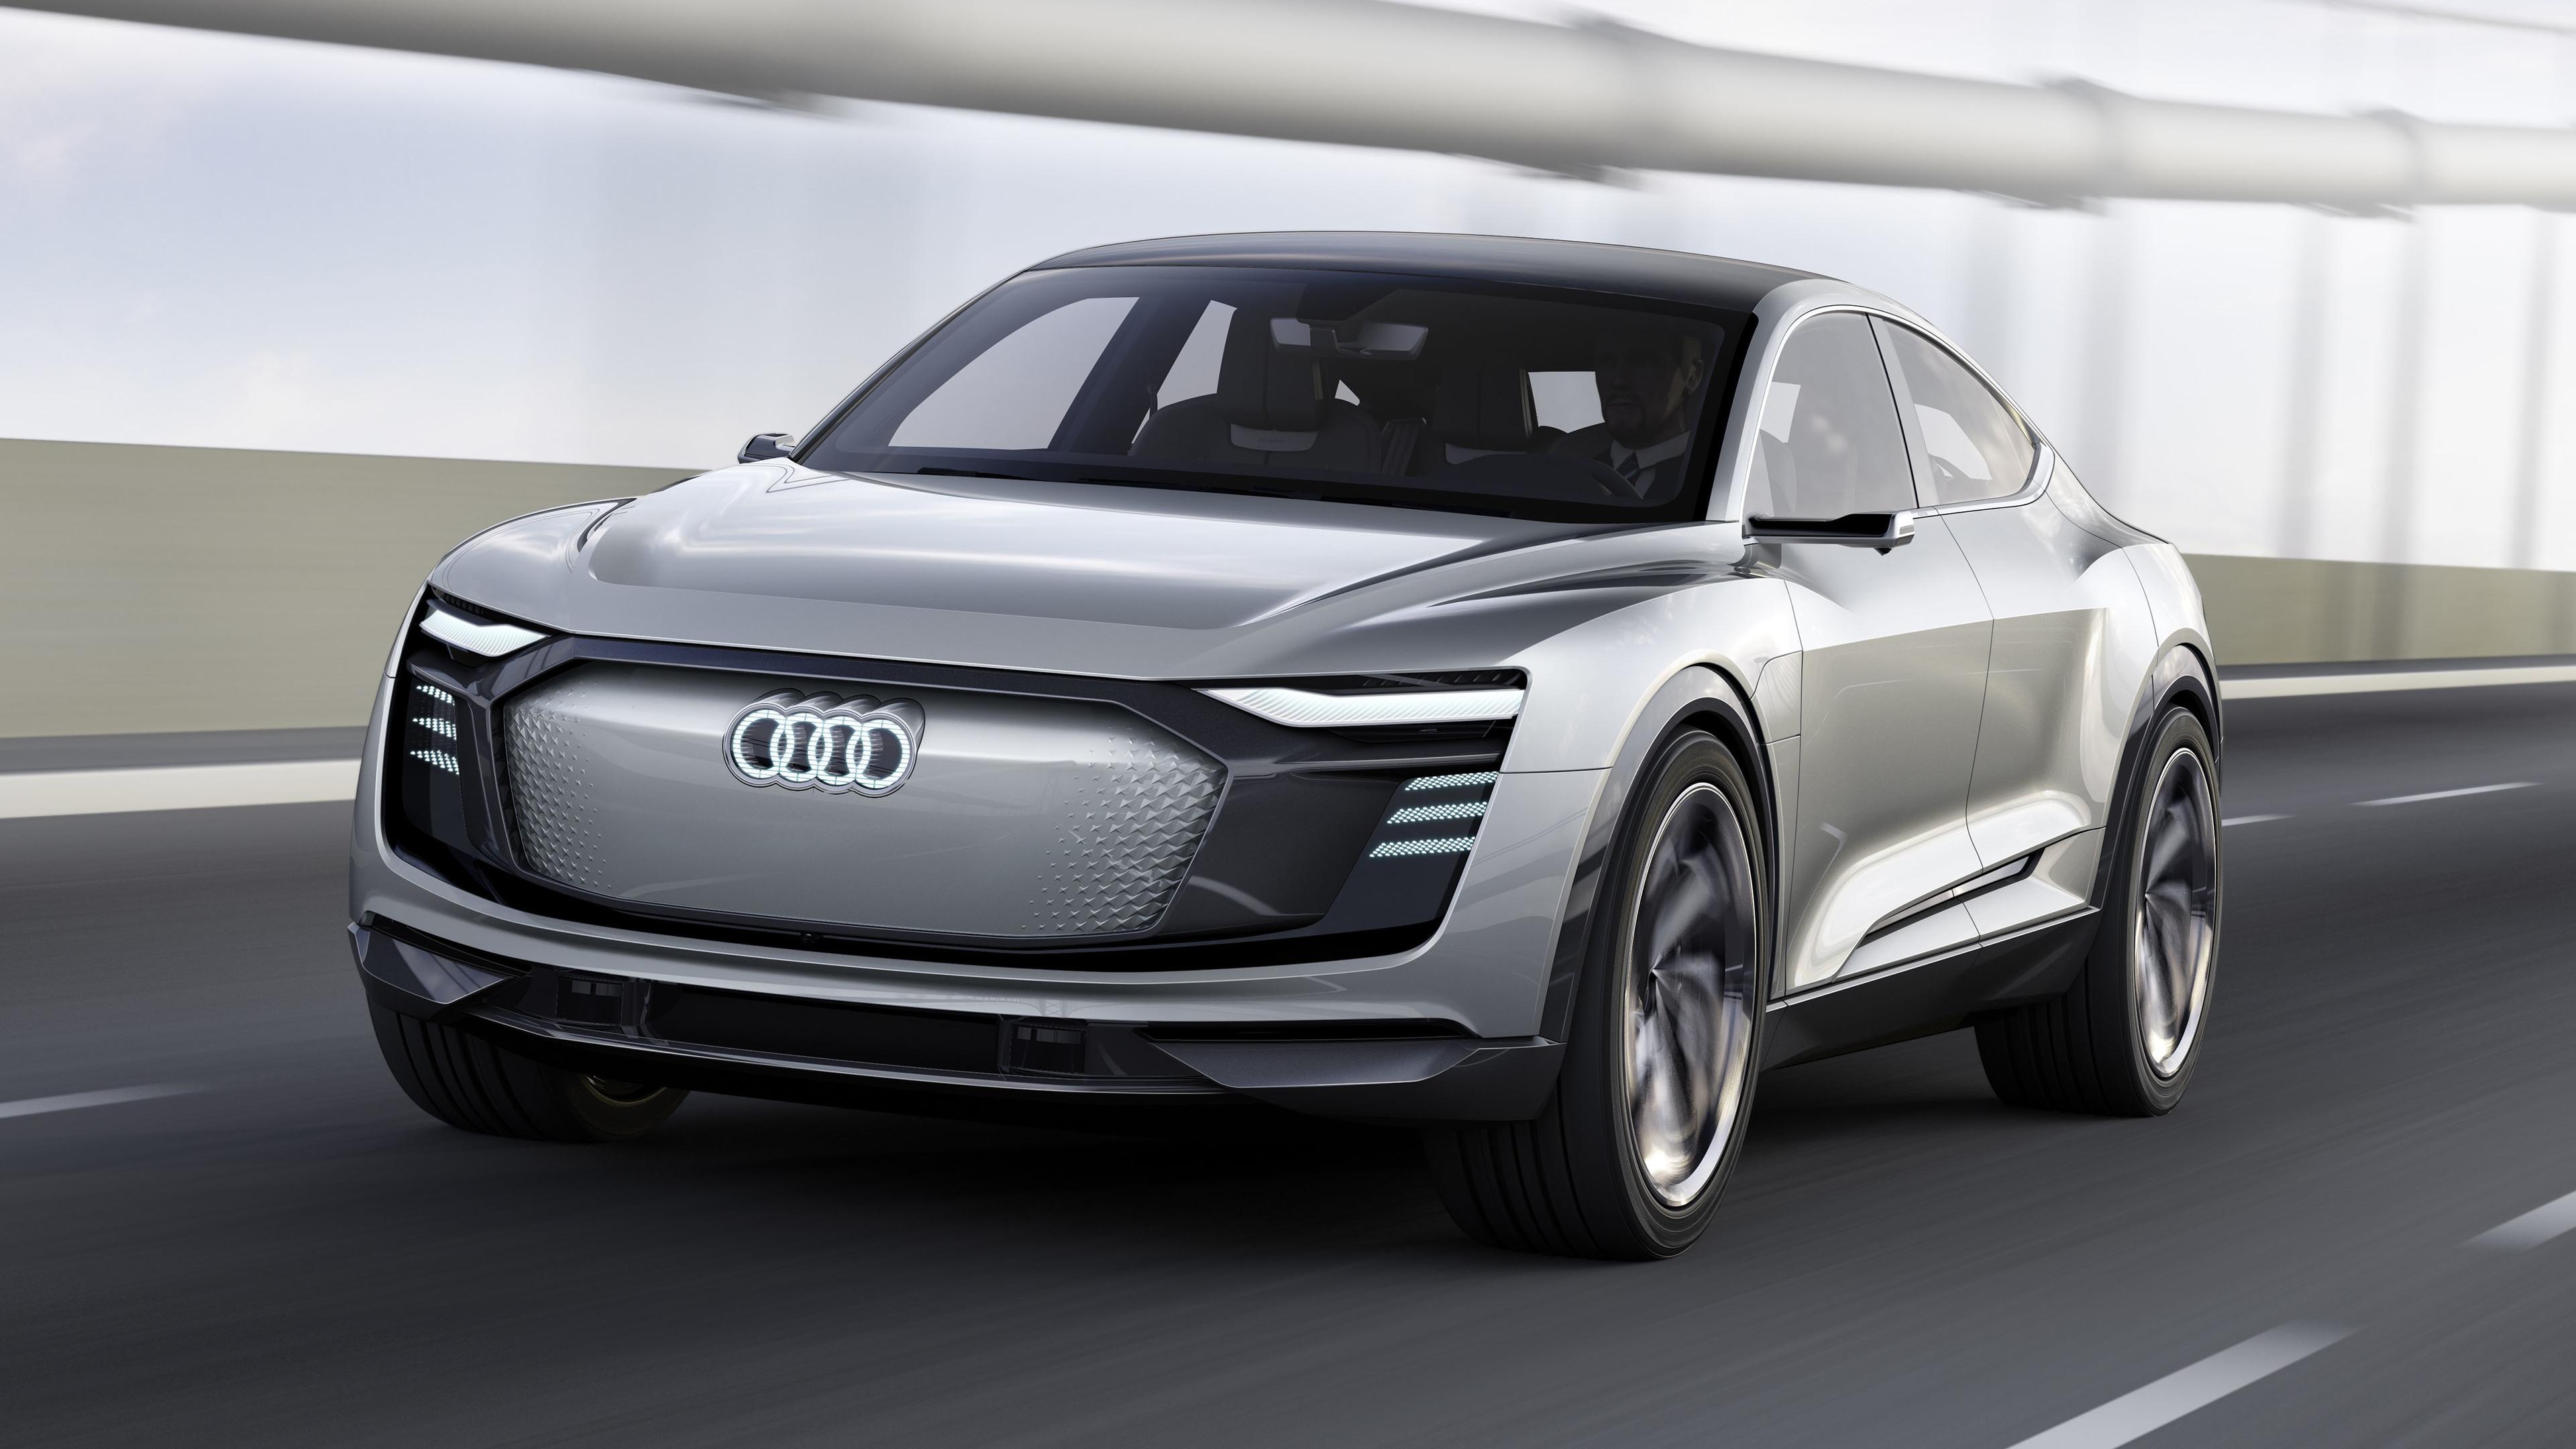 2017 audi e tron sportback concept 4k 1539105243 - 2017 Audi E Tron Sportback Concept 4k - hd-wallpapers, concept cars wallpapers, audi wallpapers, audi e tron wallpapers, 4k-wallpapers, 2017 cars wallpapers